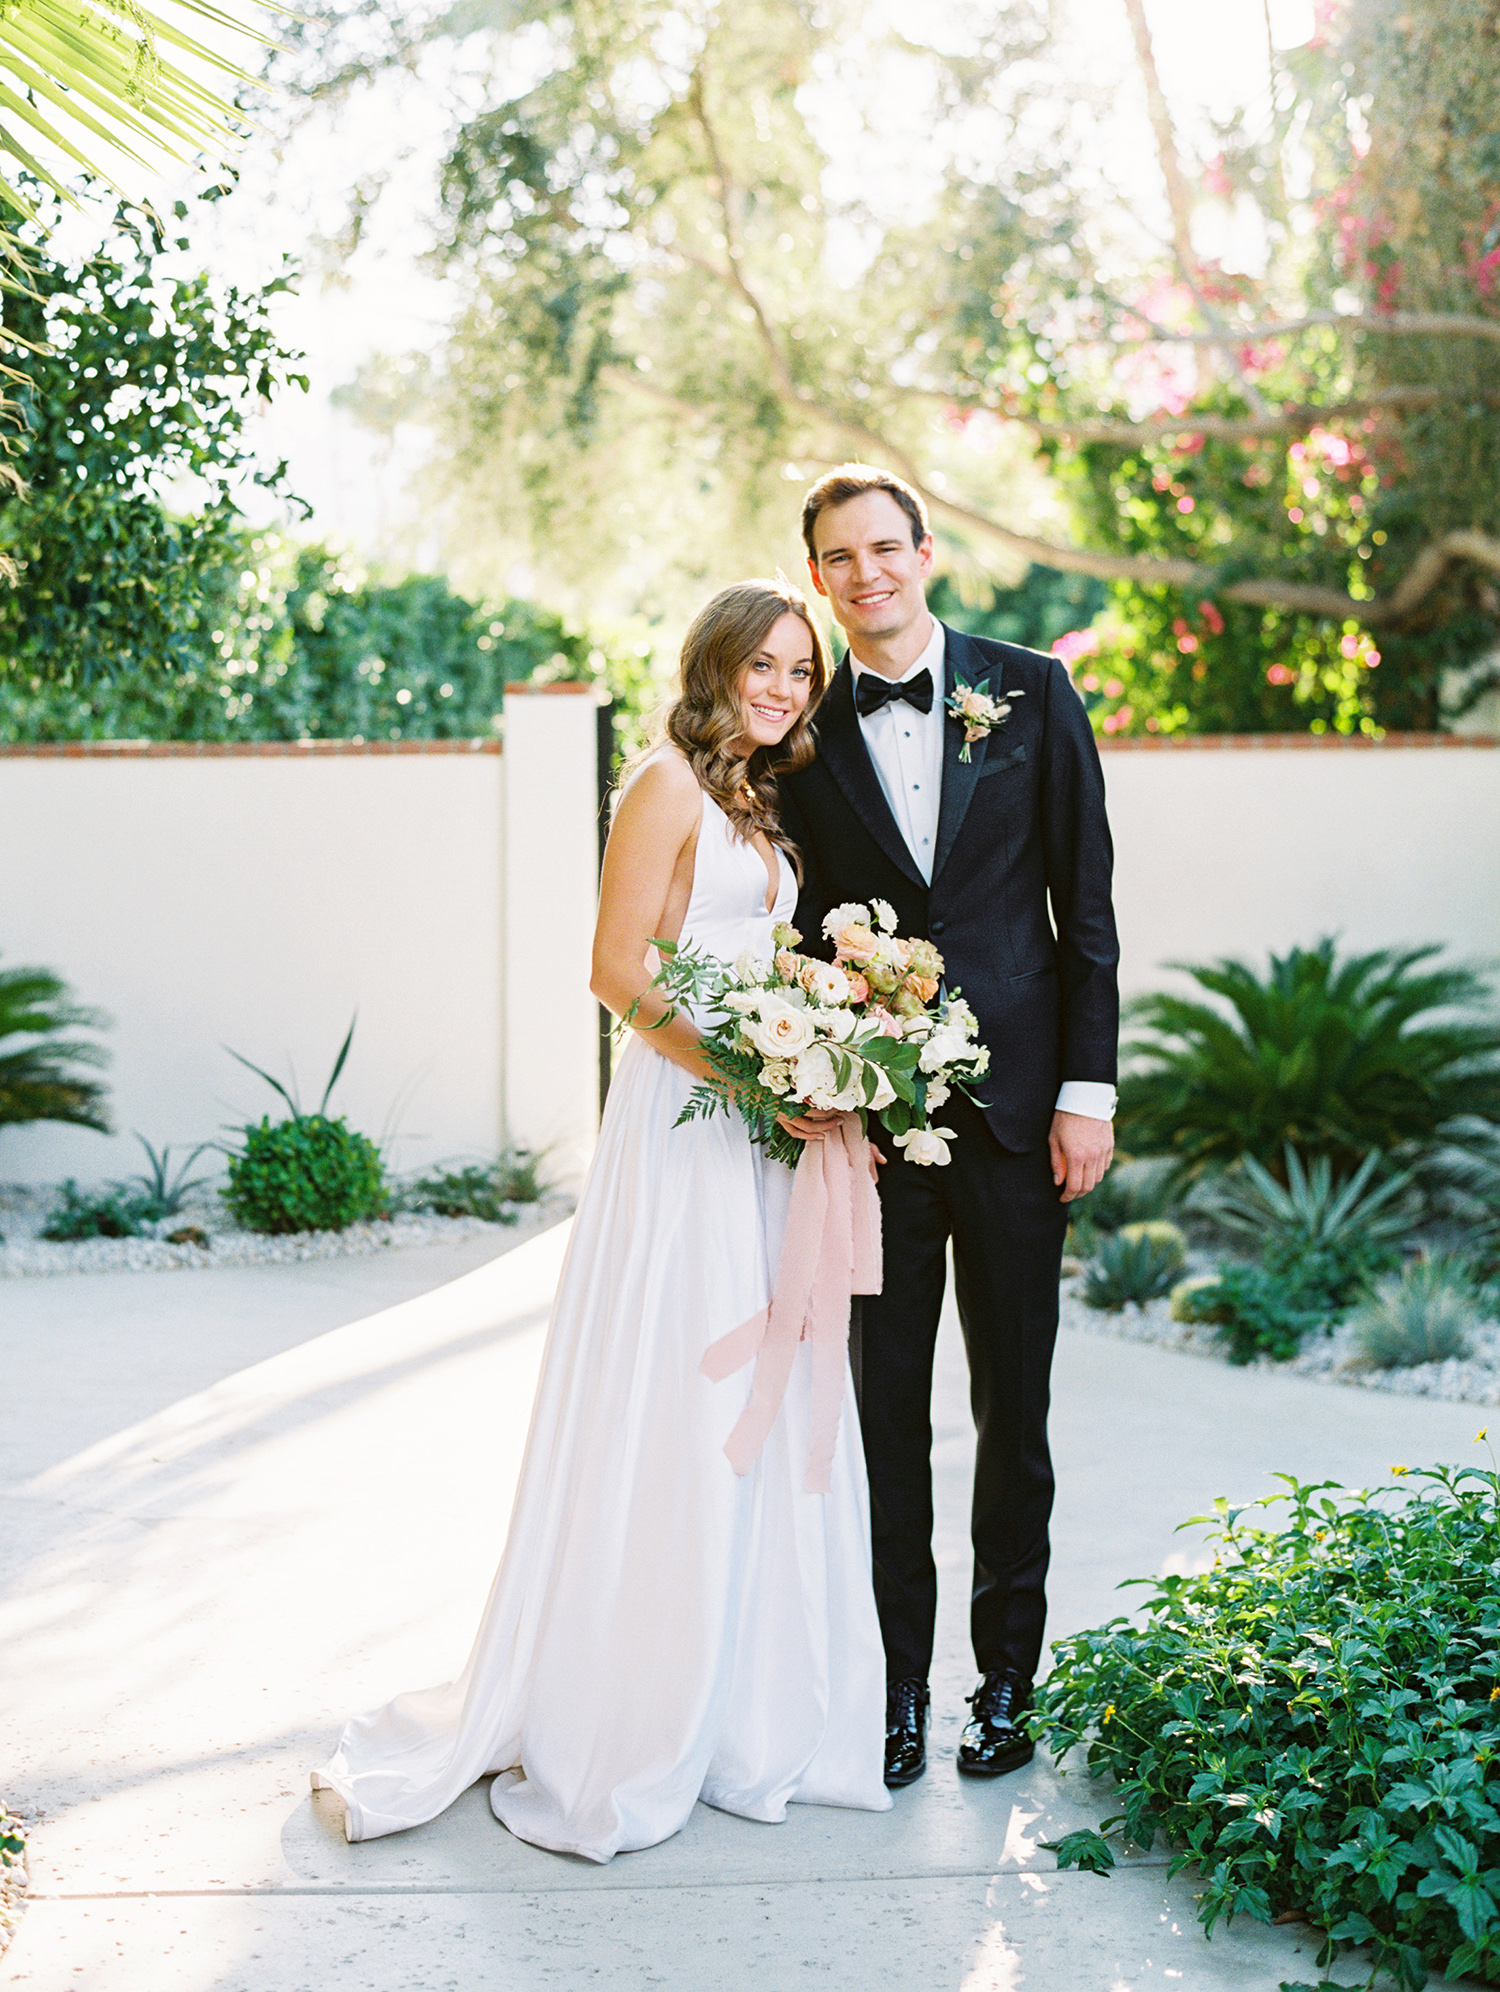 hanna will wedding couple outdoors